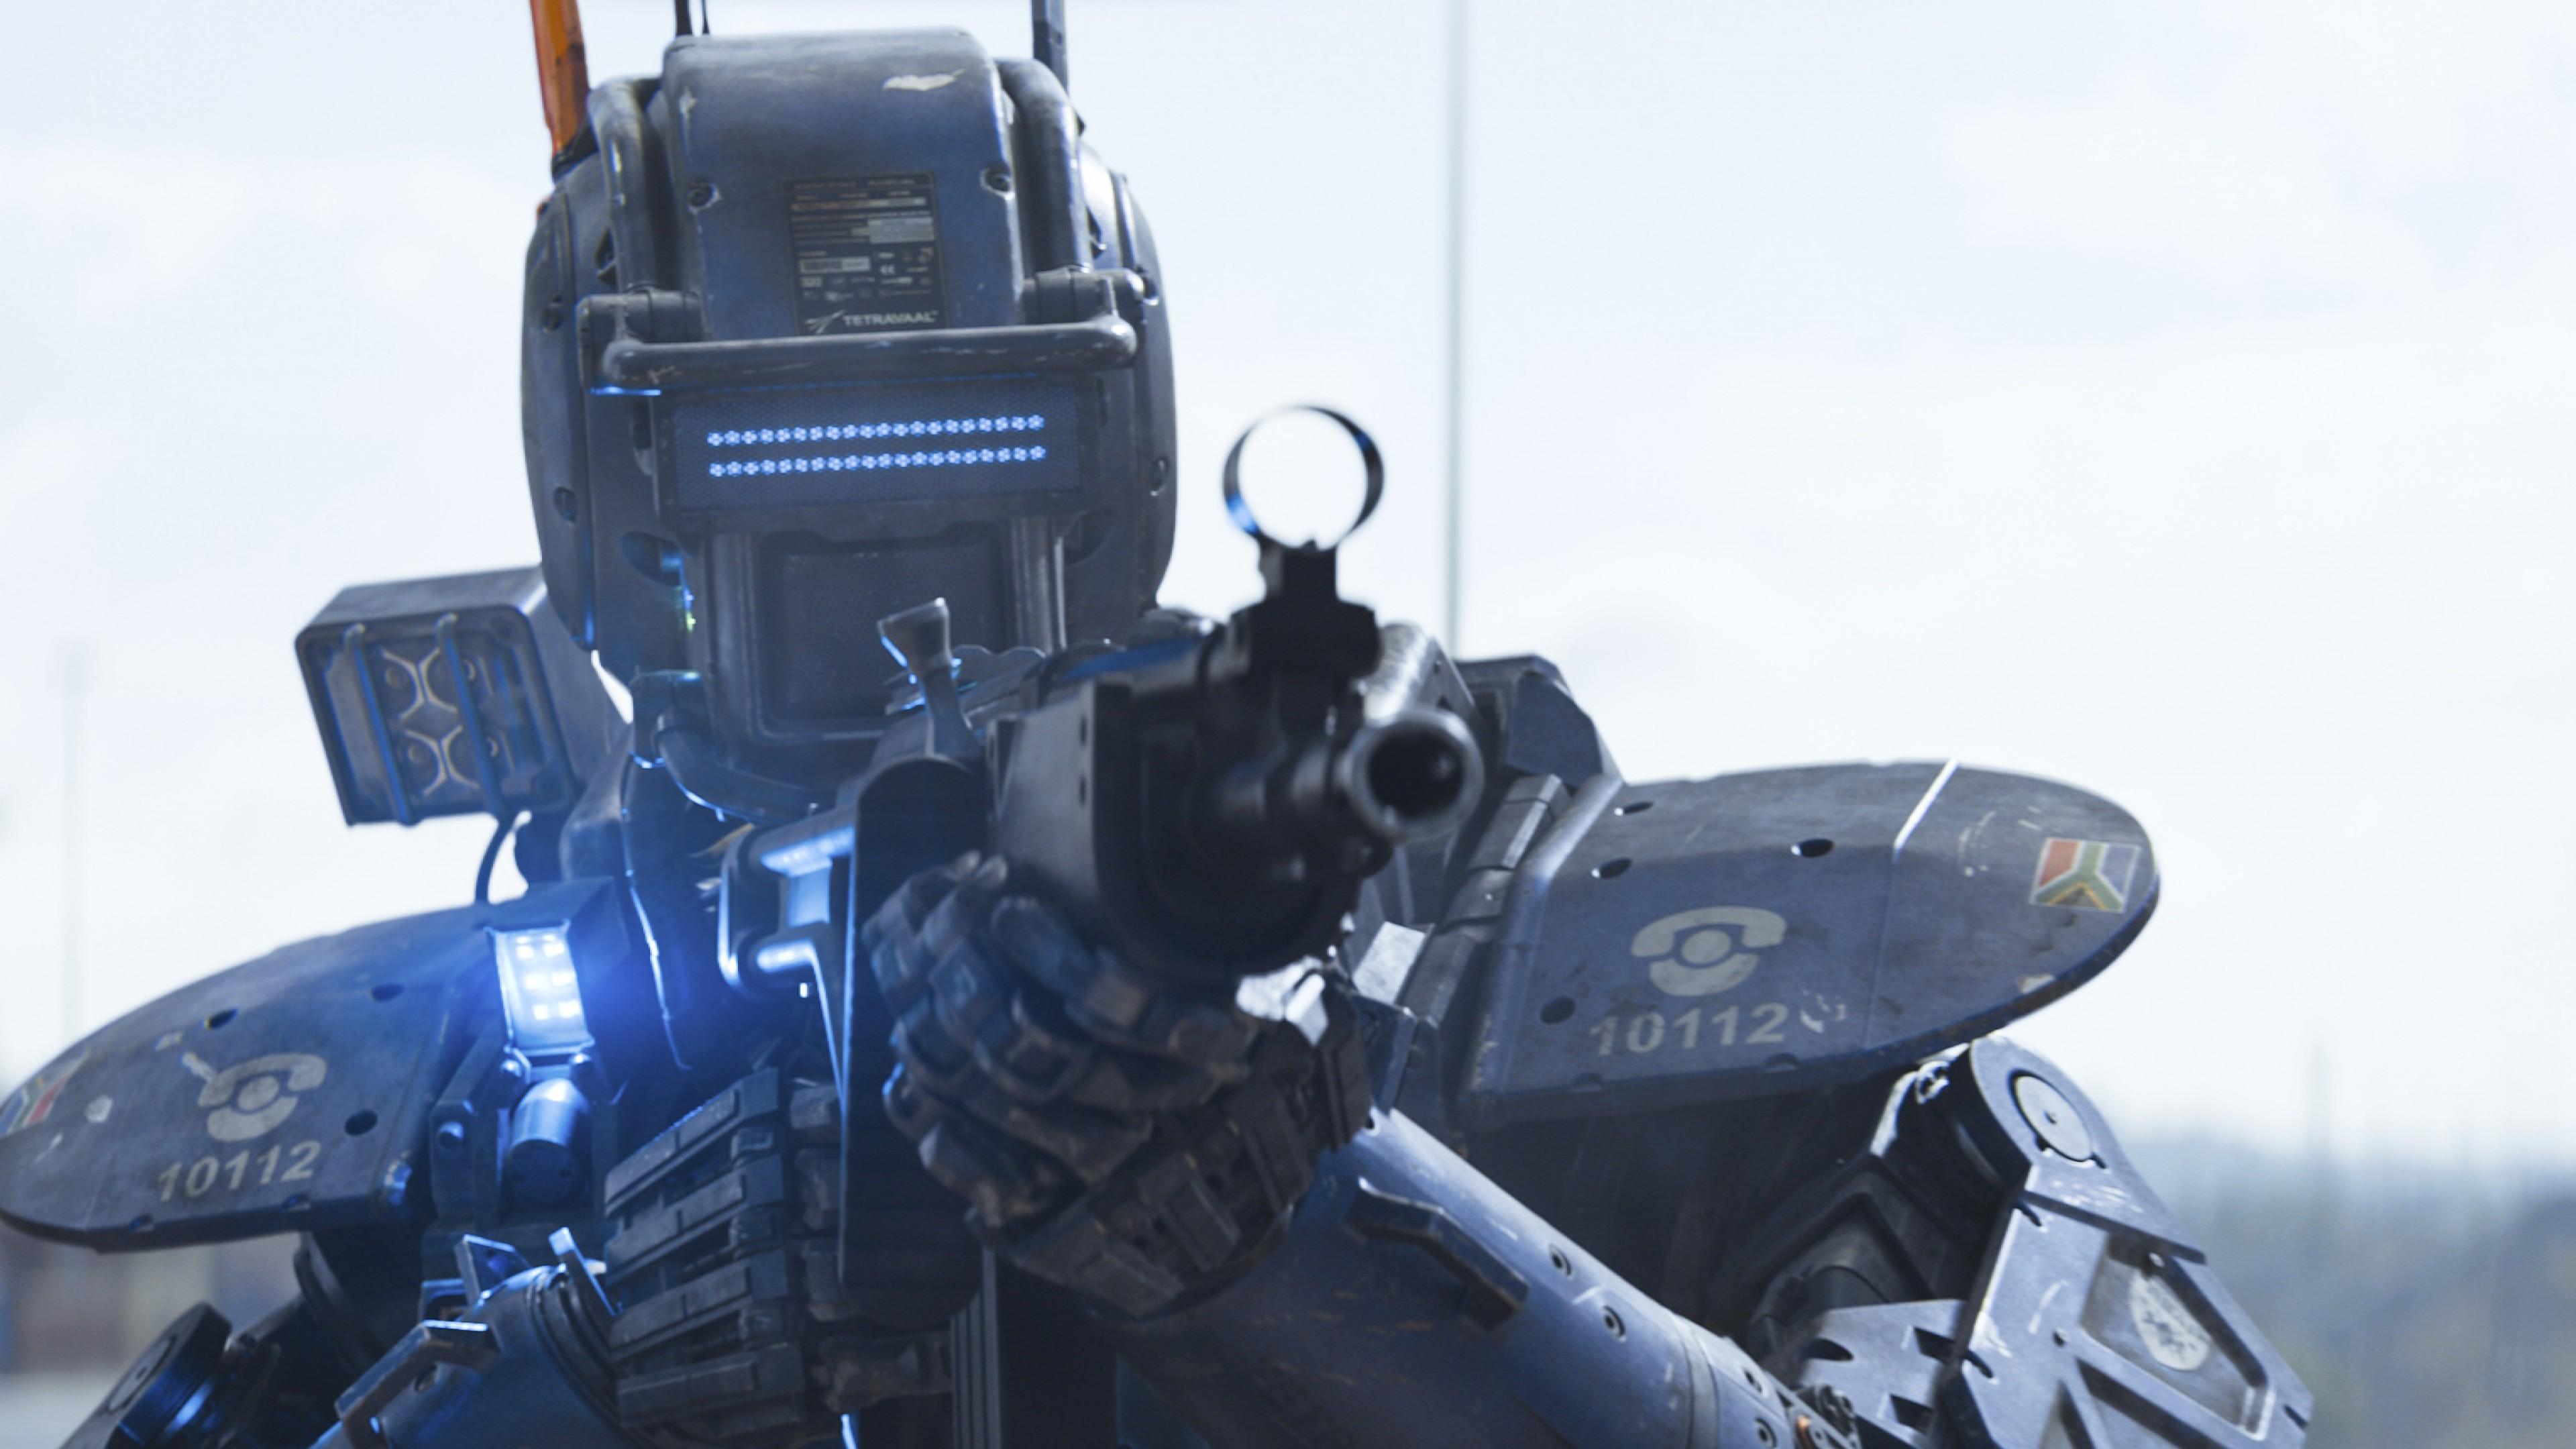 Wallpaper Chappie Best Movies Of 2015 Robot Police